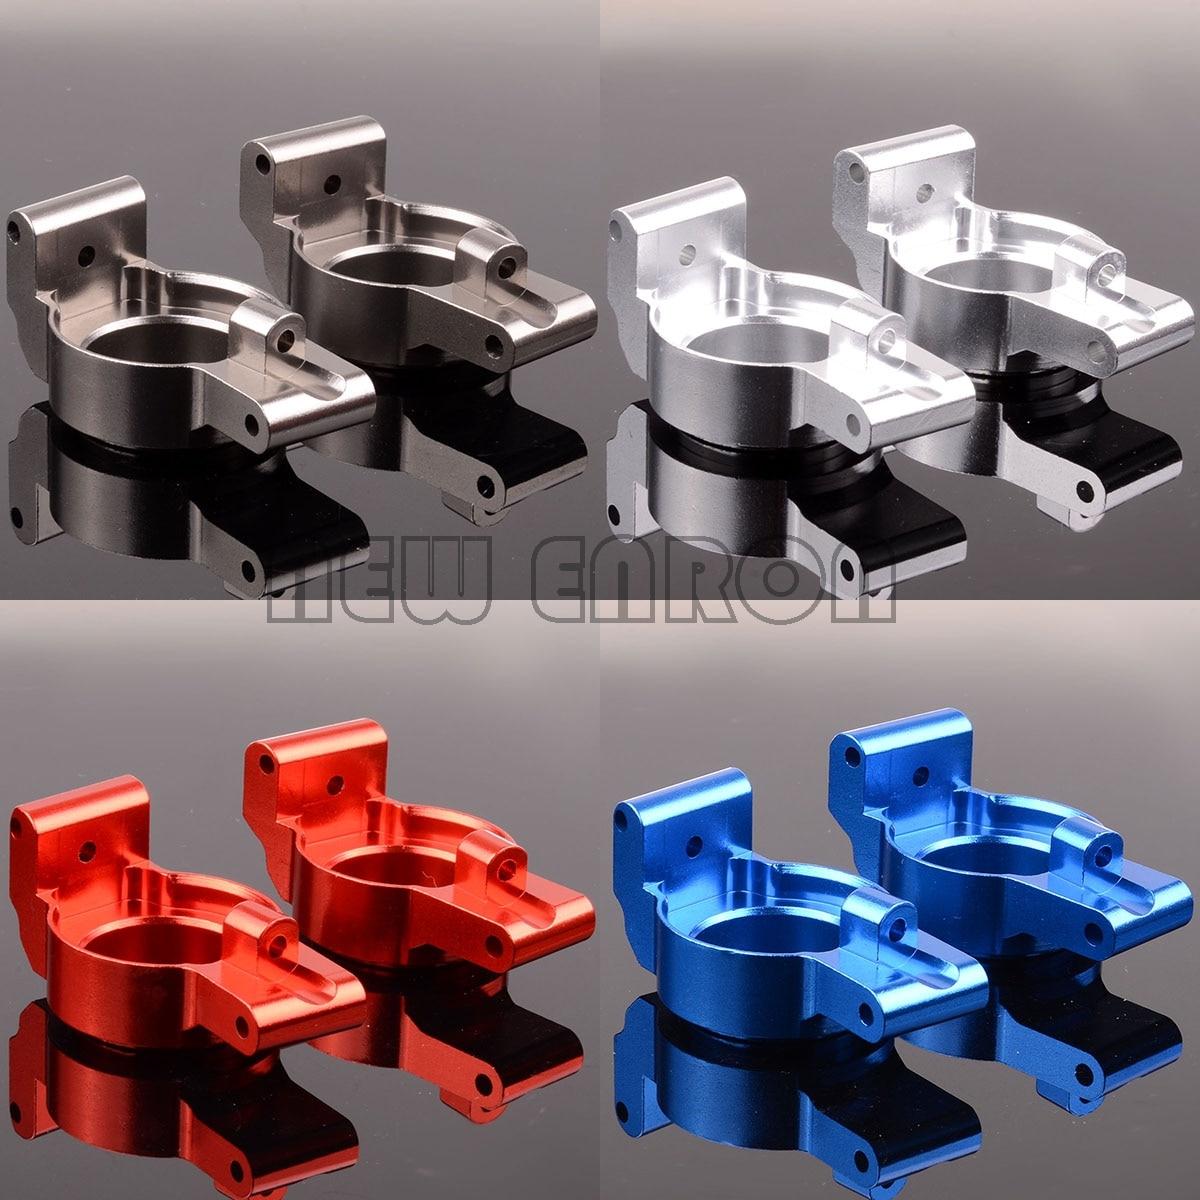 NEW ENRON #7732 2Pcs Aluminum Caster Blocks (C-hubs) Left&Right Metal For RC Car 1/5 Traxxas X-Maxx XMaxx 77076-4 77086-4